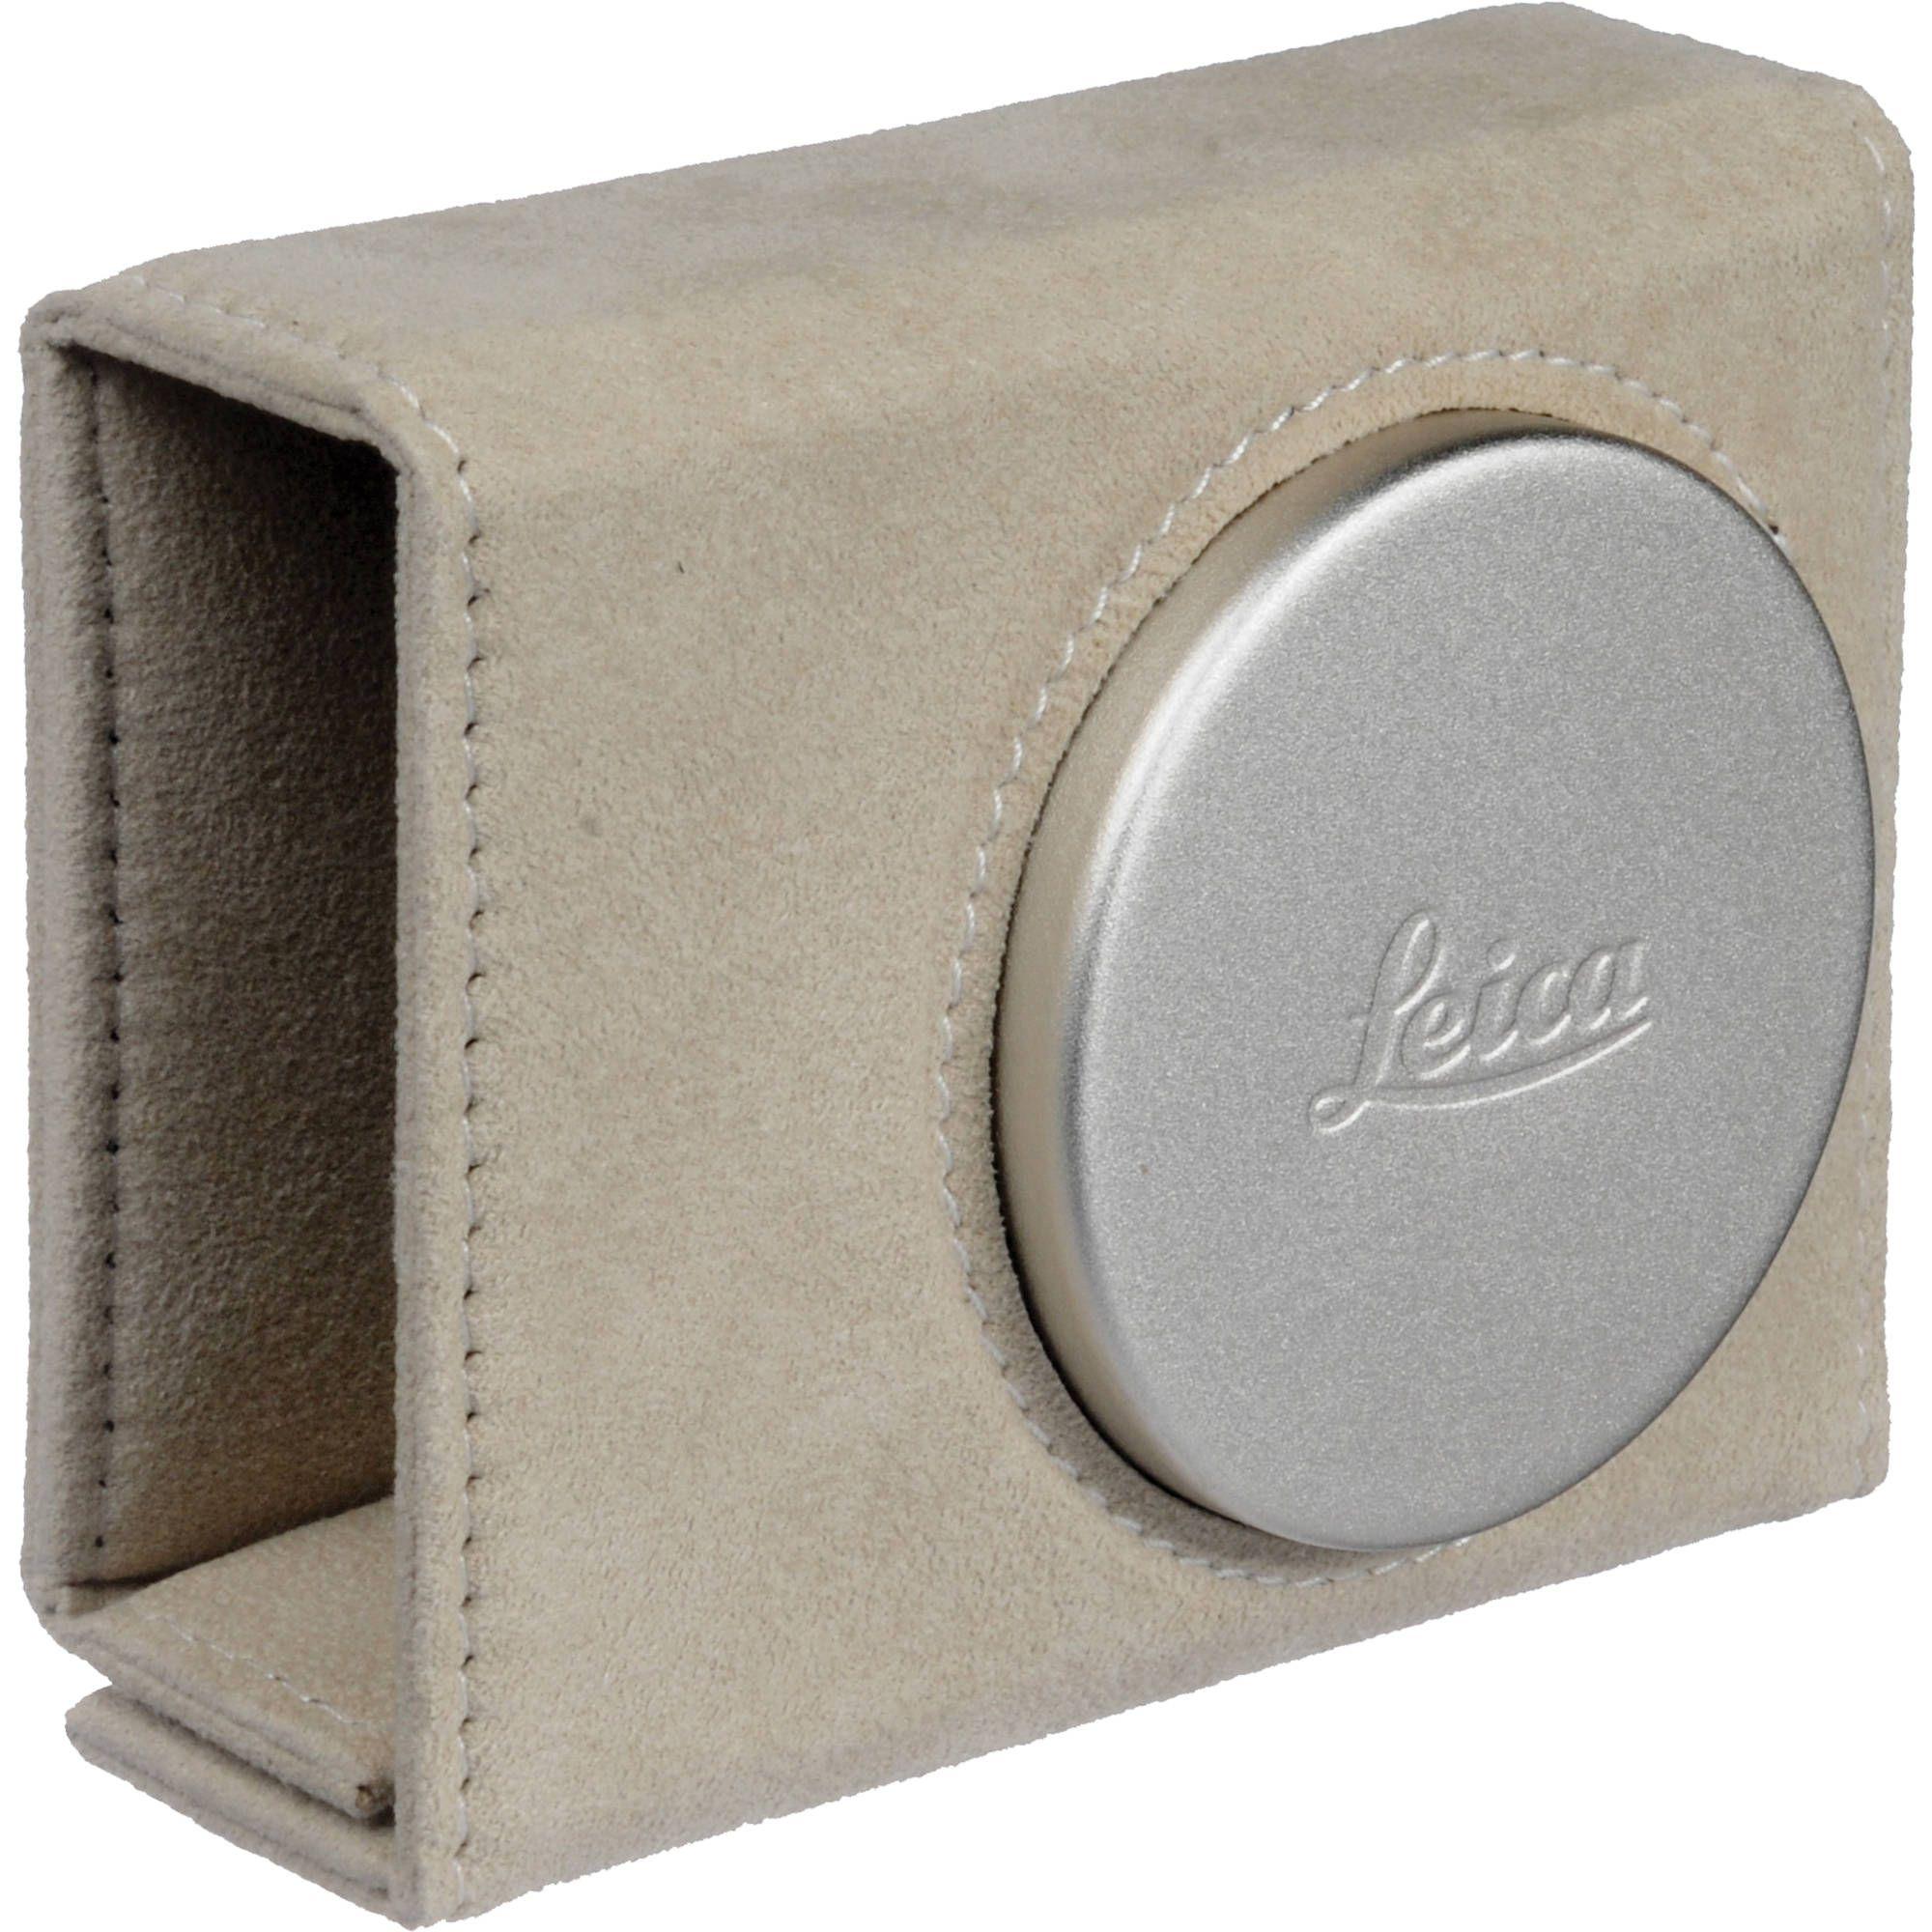 Leica C Twist Case For Digital Camera Light Gold We Love Lux